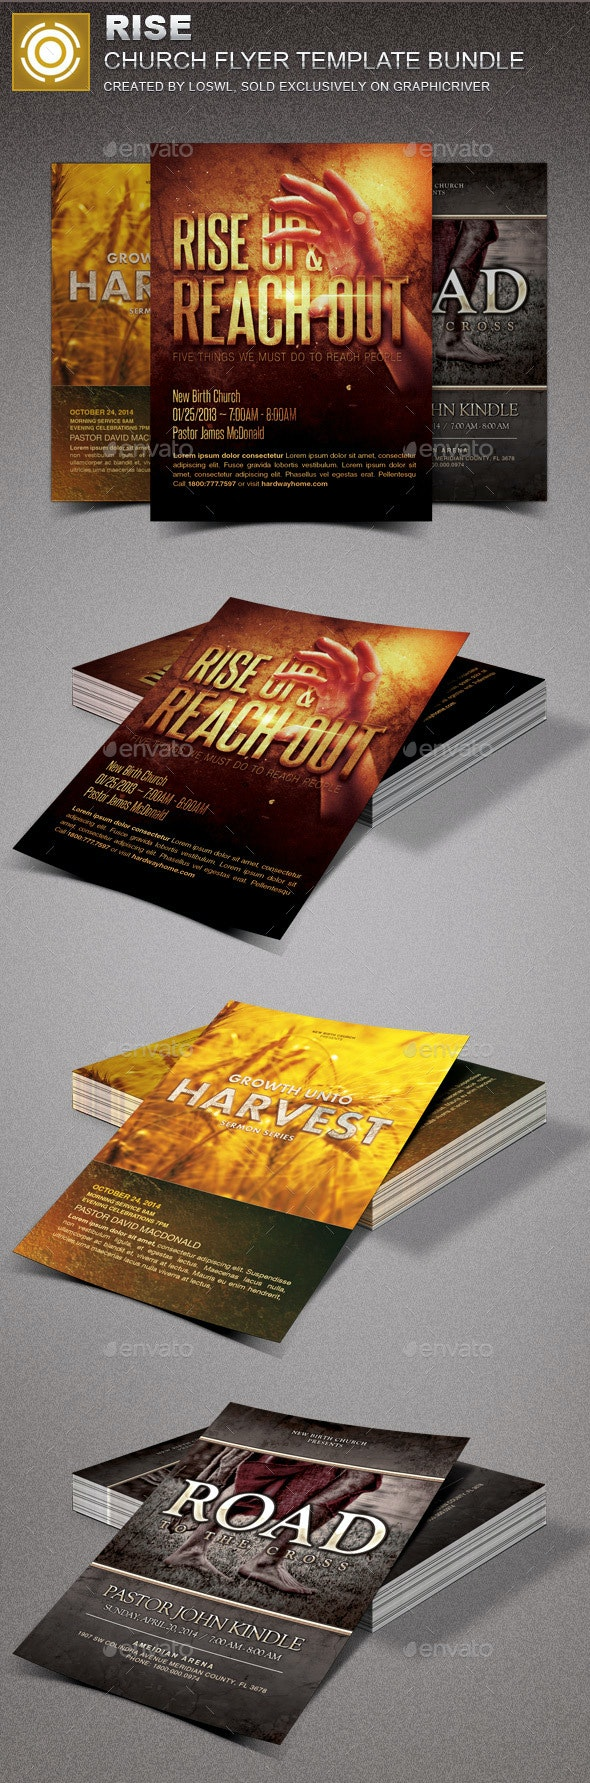 Rise Church Marketing Flyer Template Bundle - Church Flyers